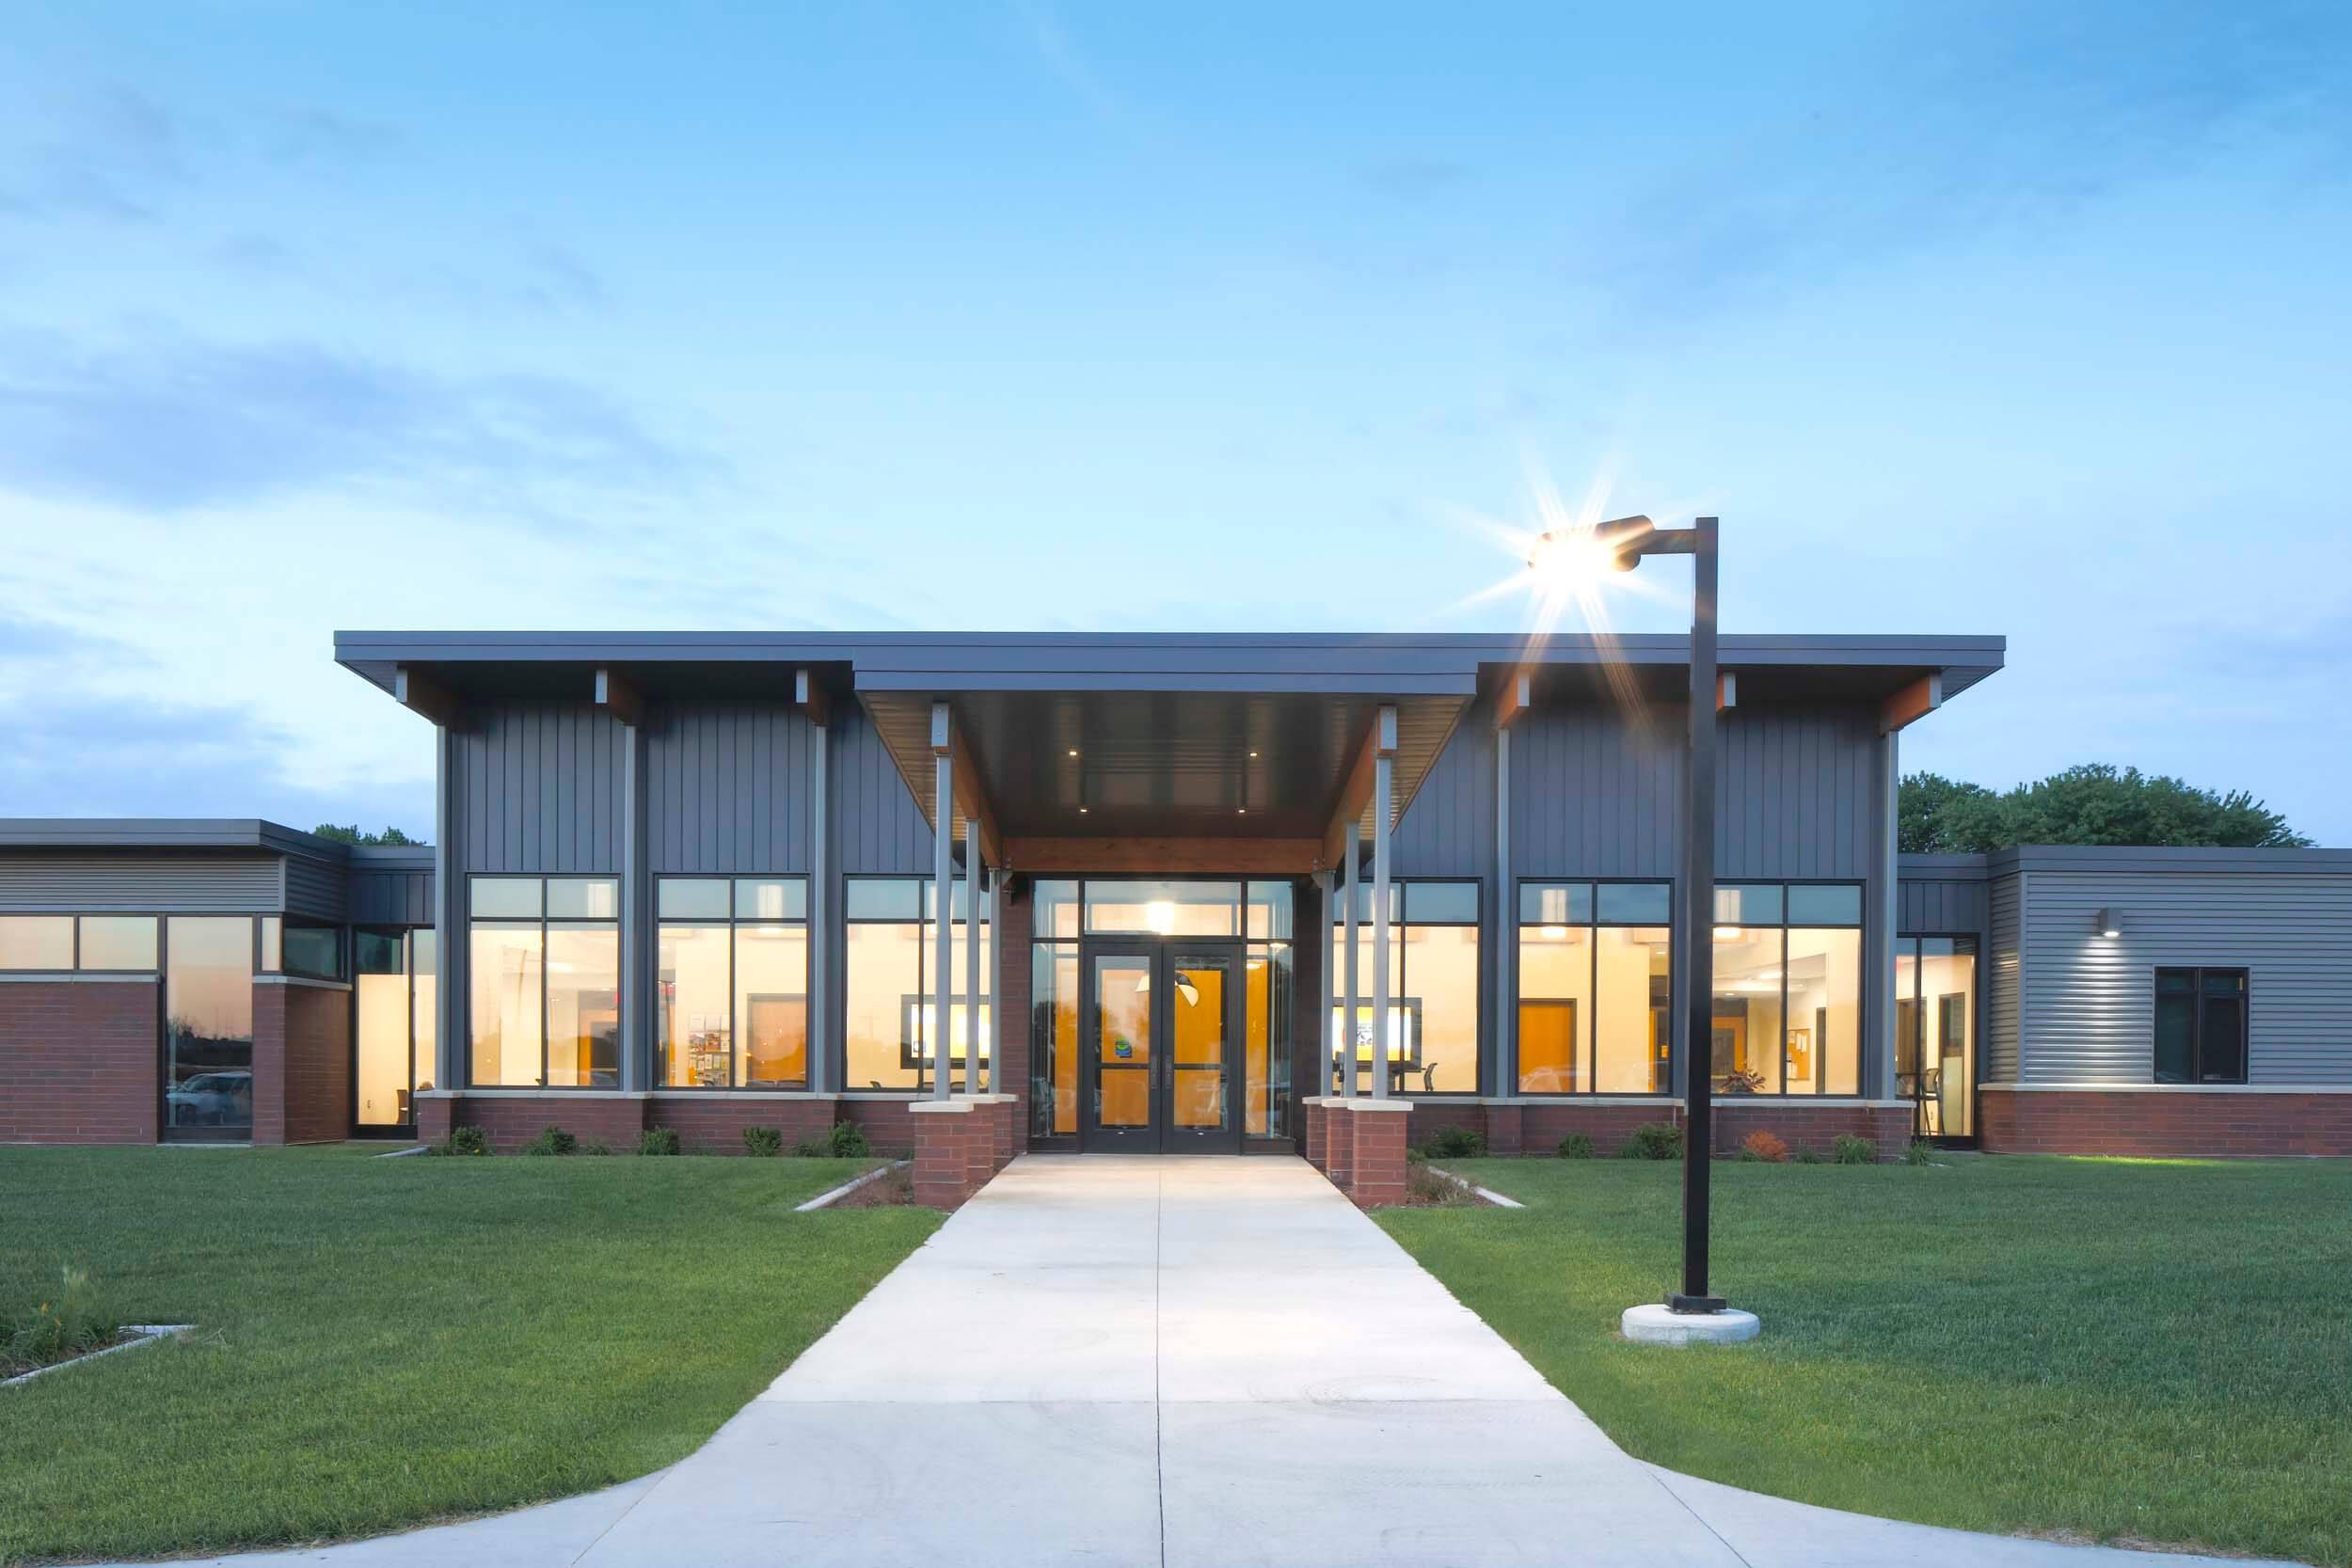 77_Ames Community School District Administration Building